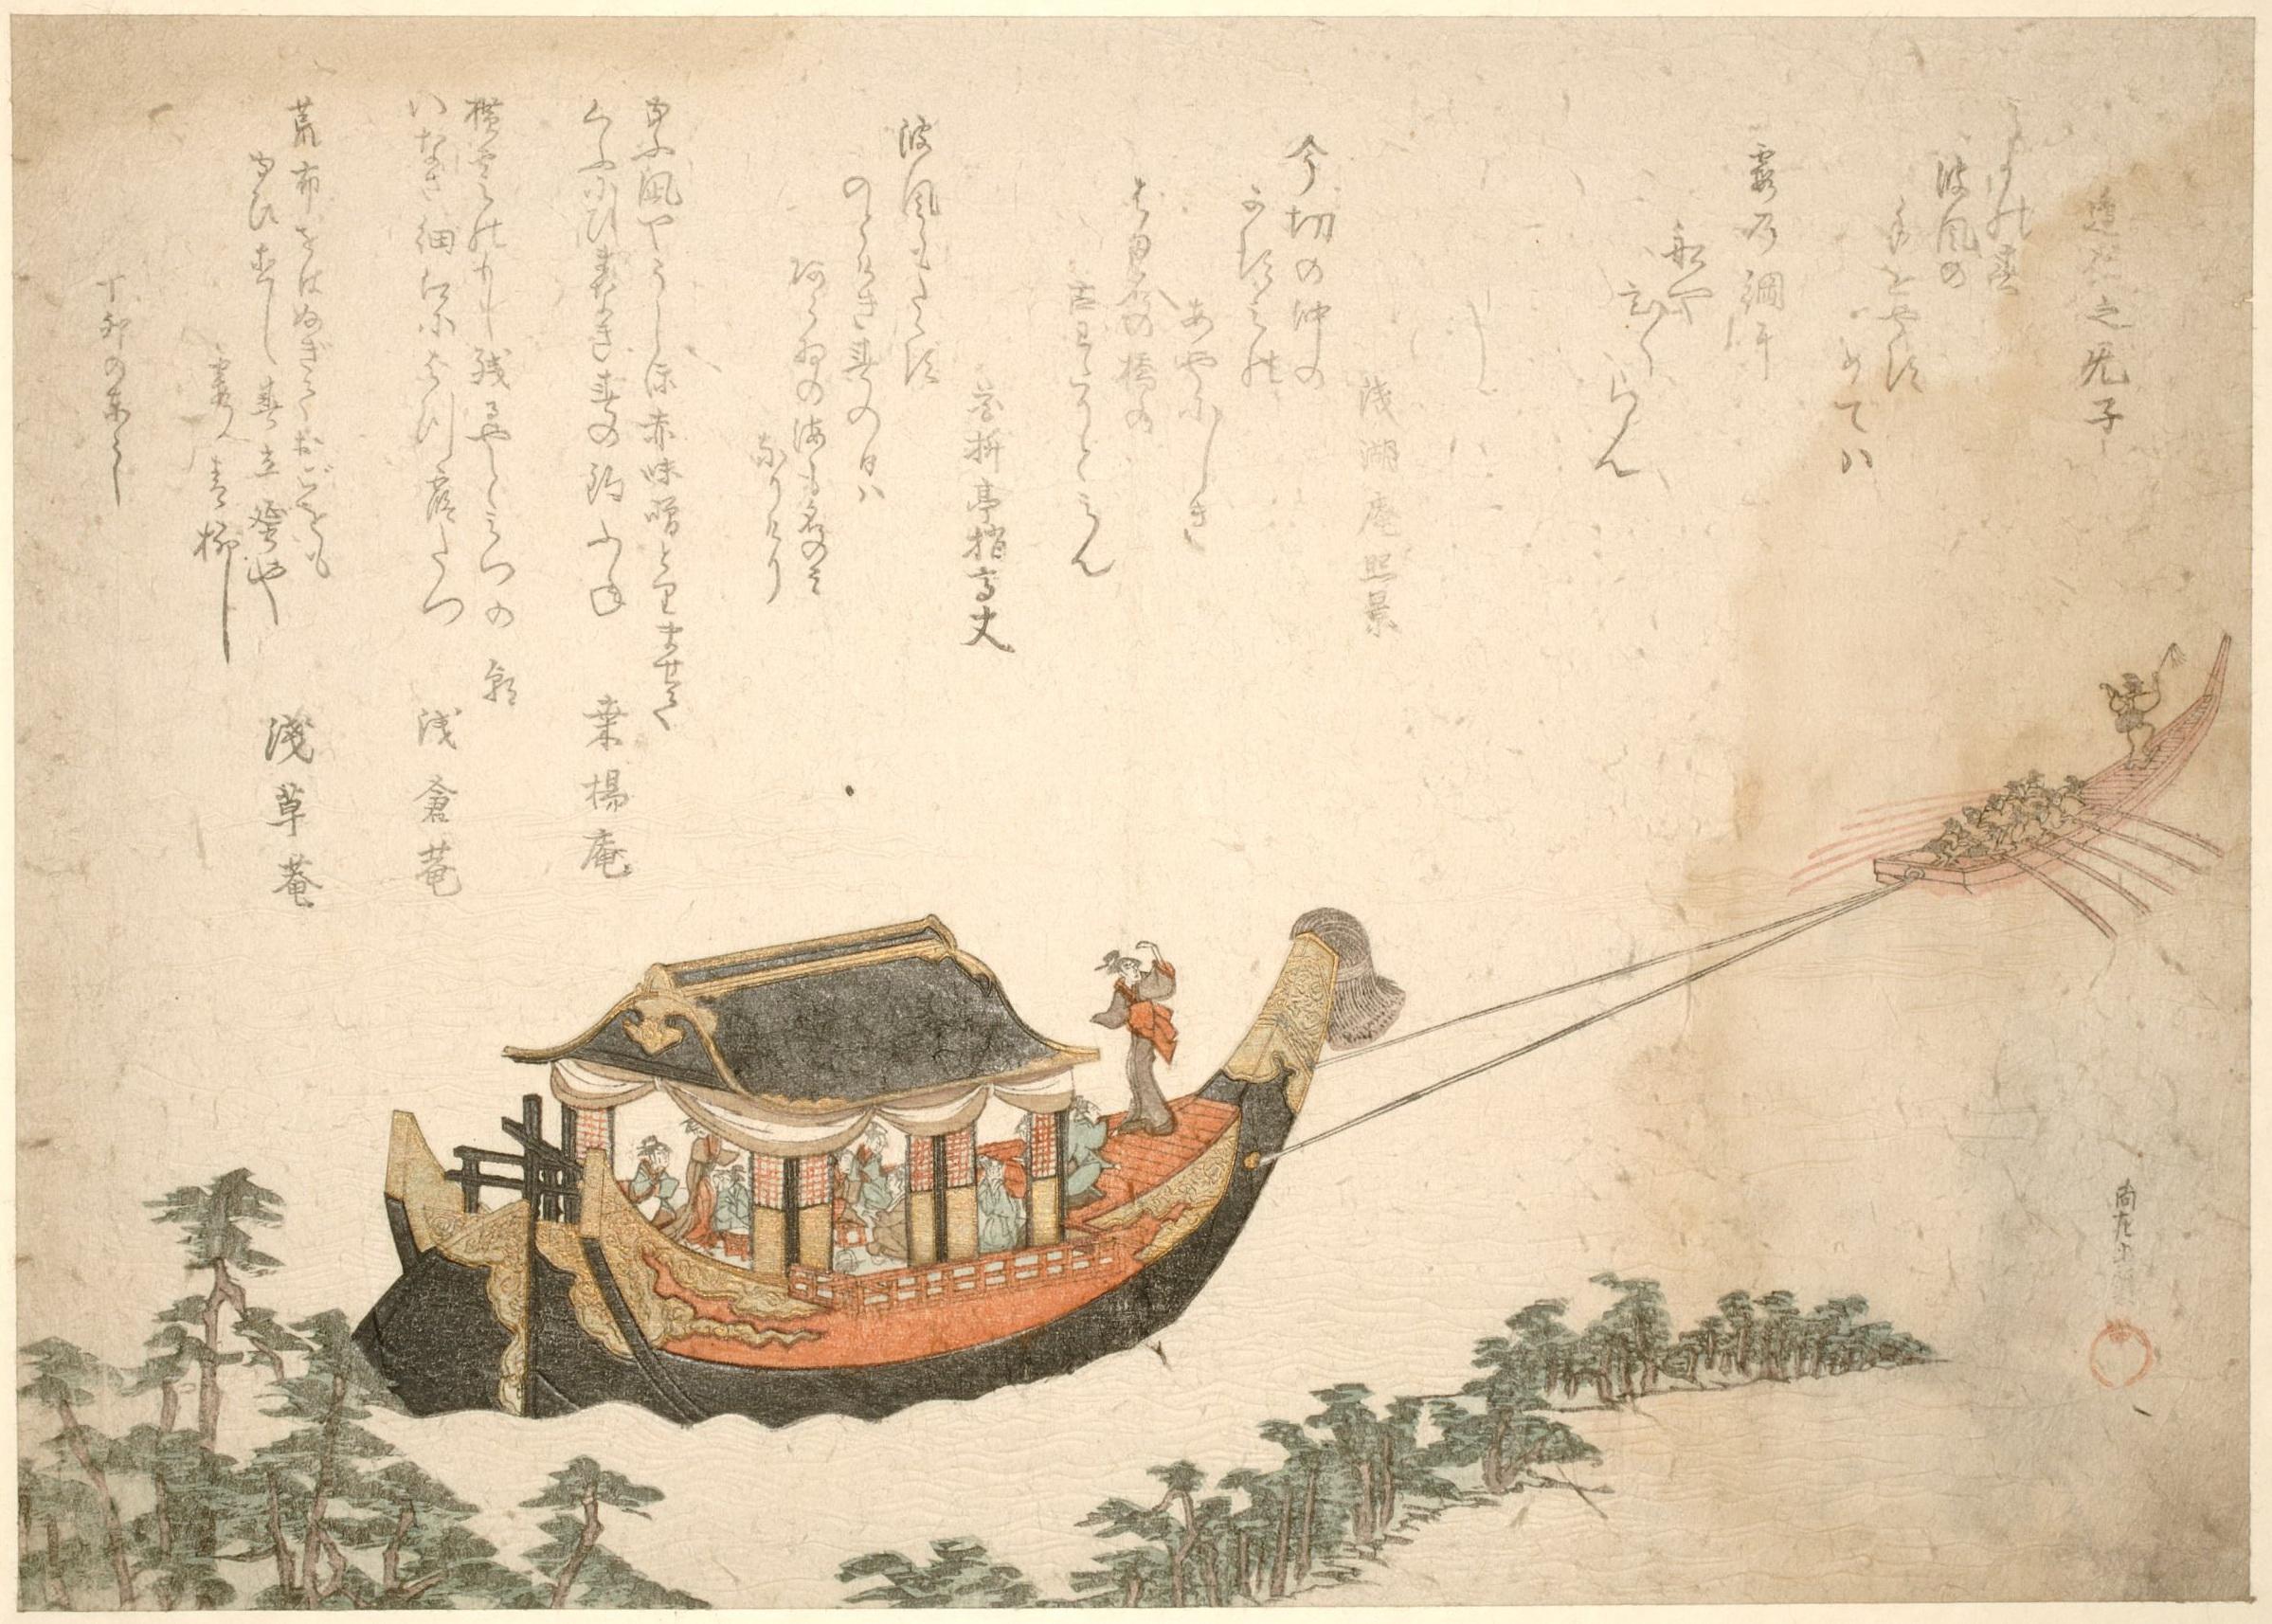 Лодка даймё у побережья Миё. На борту лодки дамы наслаждаются чаепитием_1807